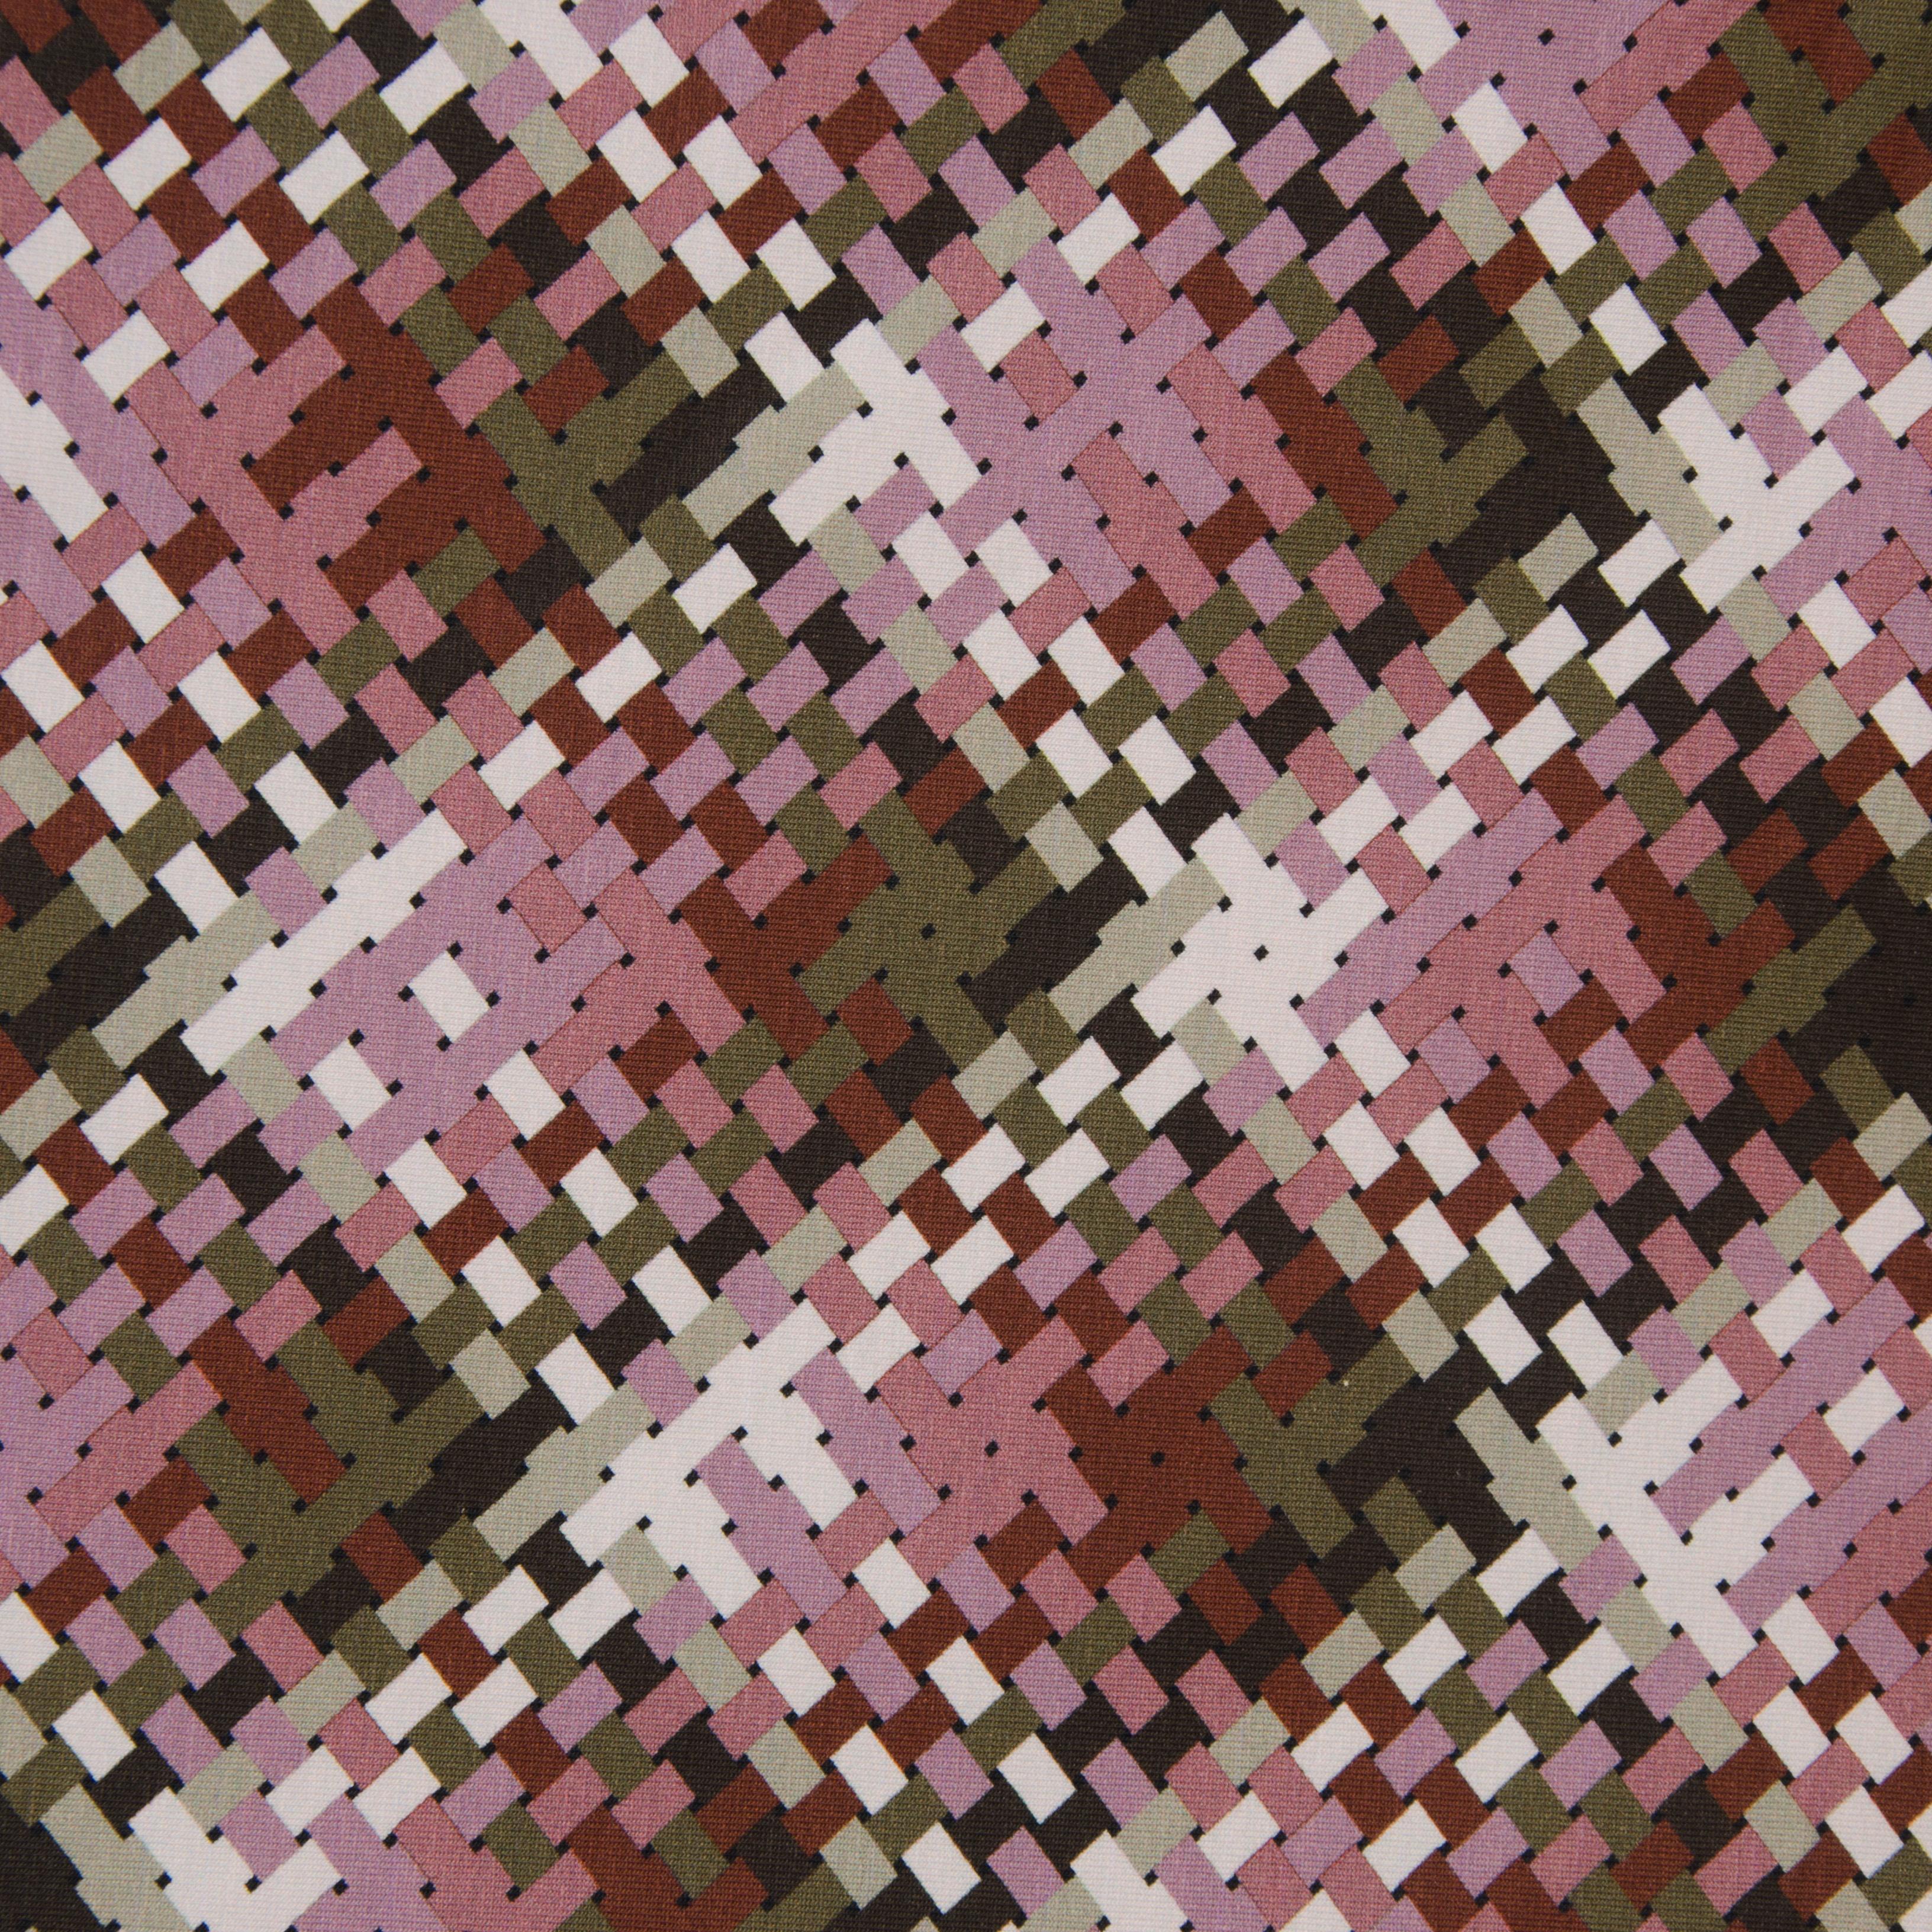 Sweat - Cross Stitch rosa/grau von Hilco